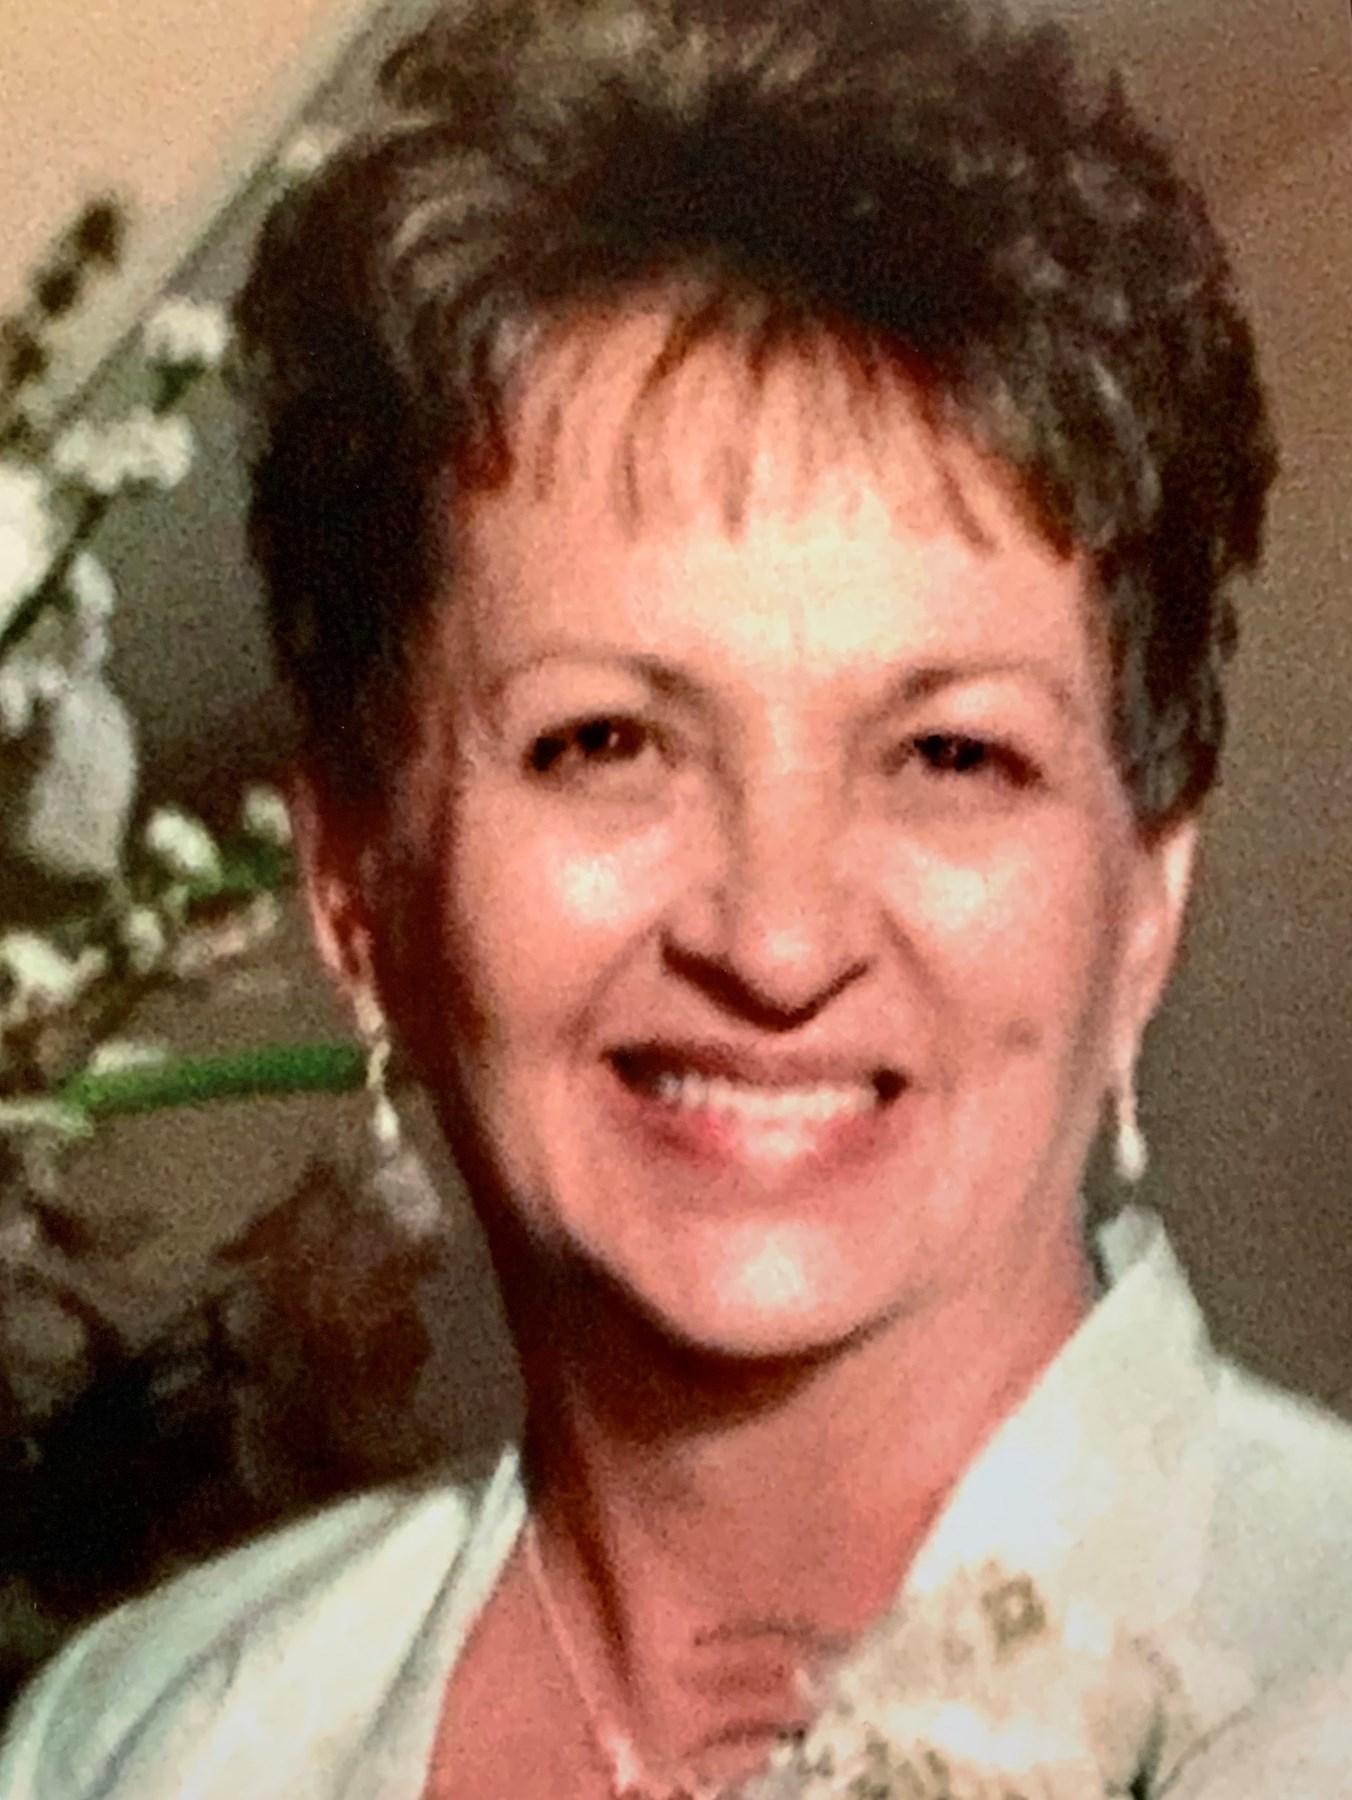 Rosemary hannan lagrange obituary chalmette la - St bernard memorial gardens obituaries ...